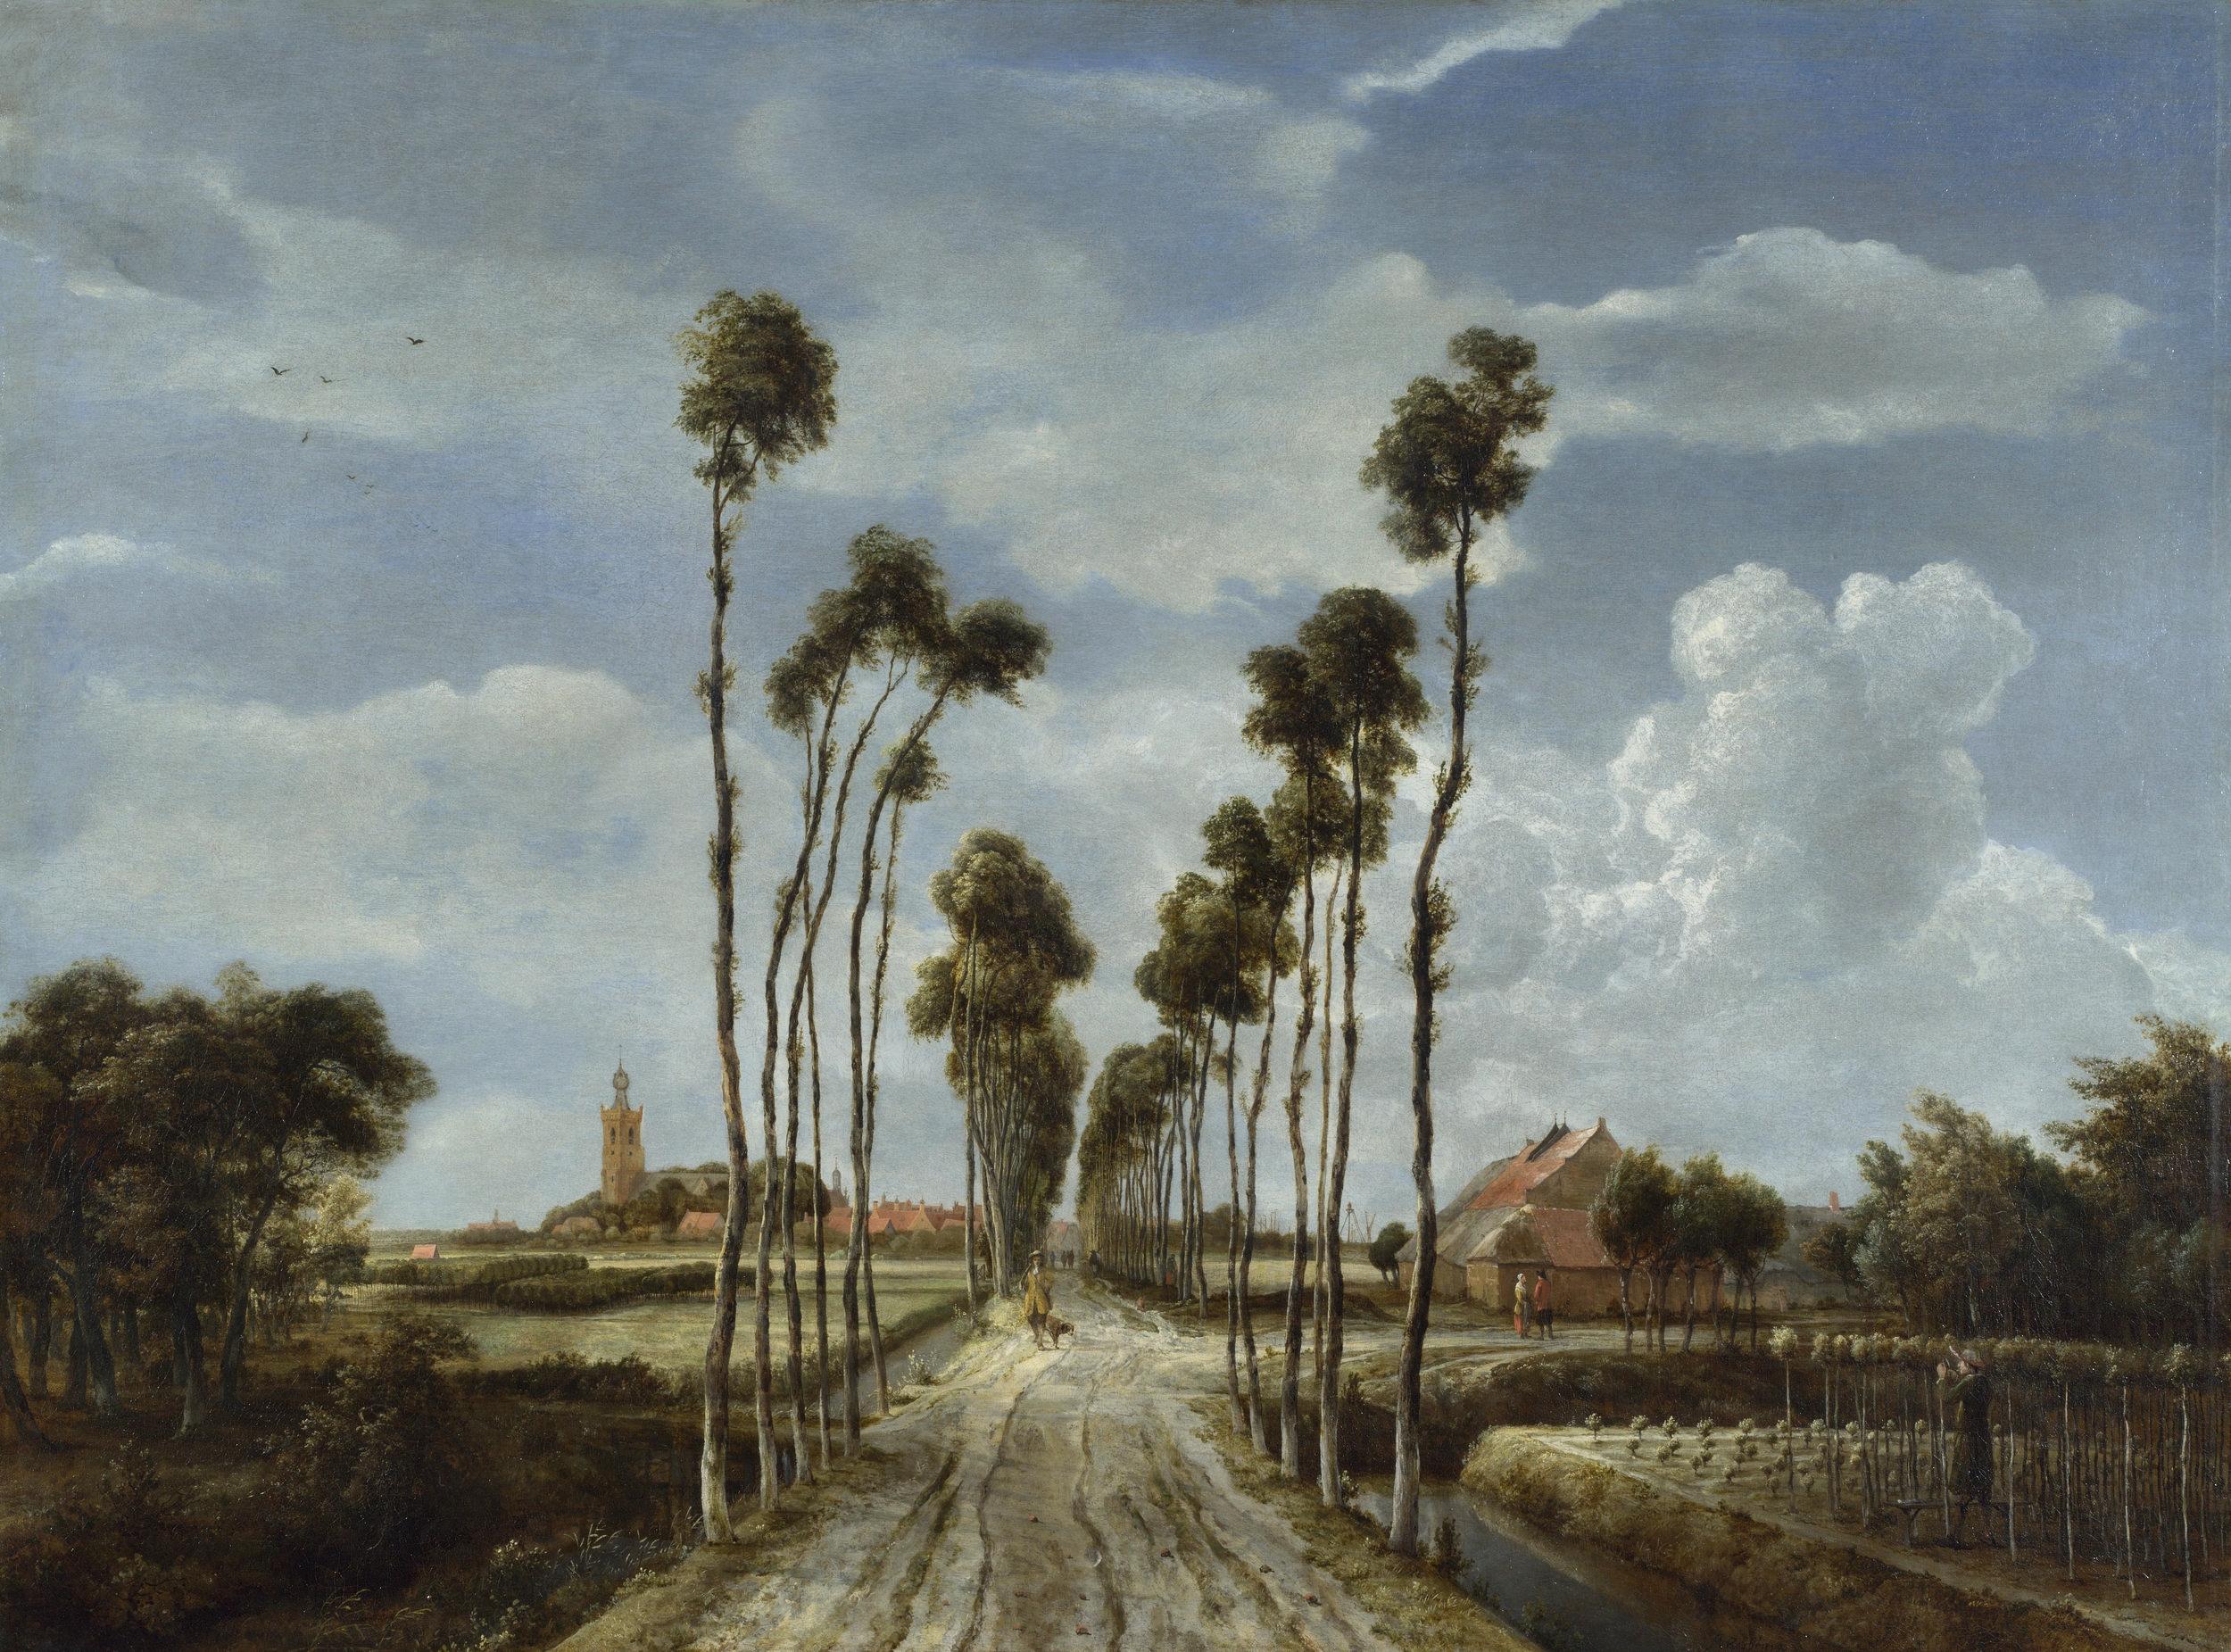 Meindert Hobbema  (1638 – 1709),   The Avenue at Middelharnis     1689